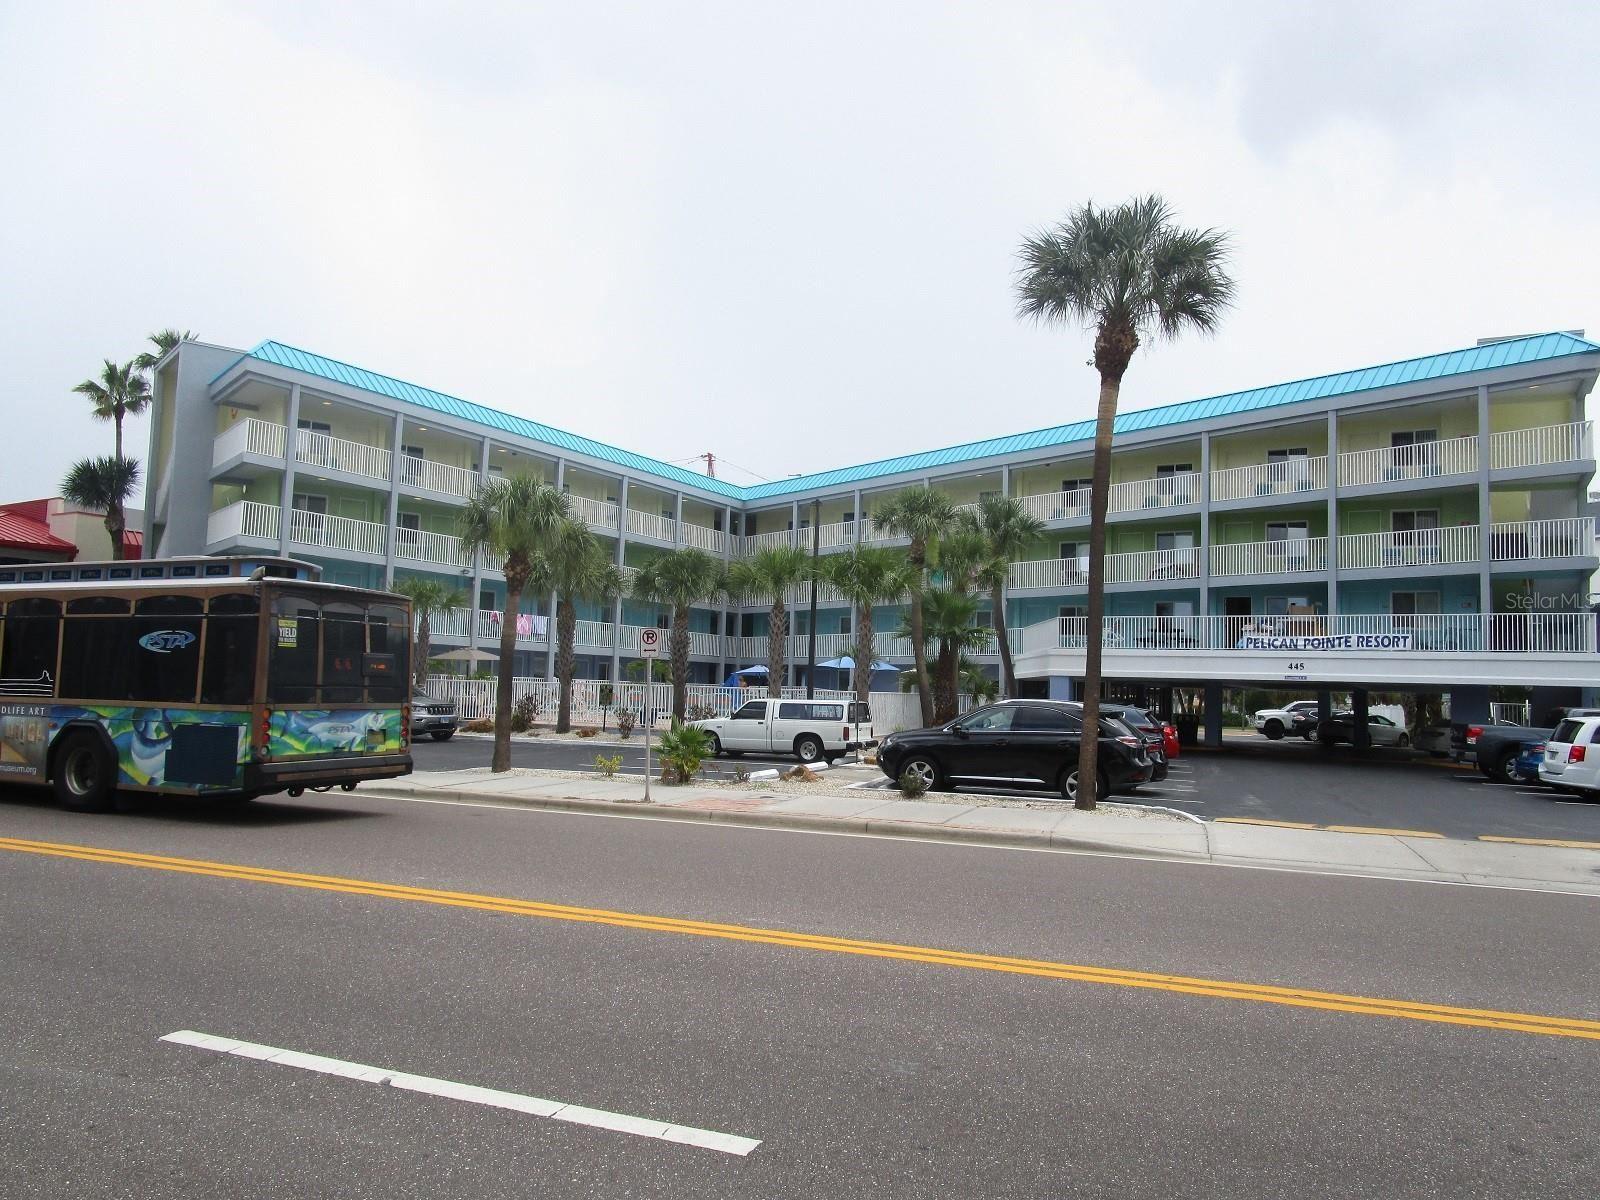 445 S GULFVIEW BOULEVARD #116, Clearwater, FL 33767 - MLS#: U8134590